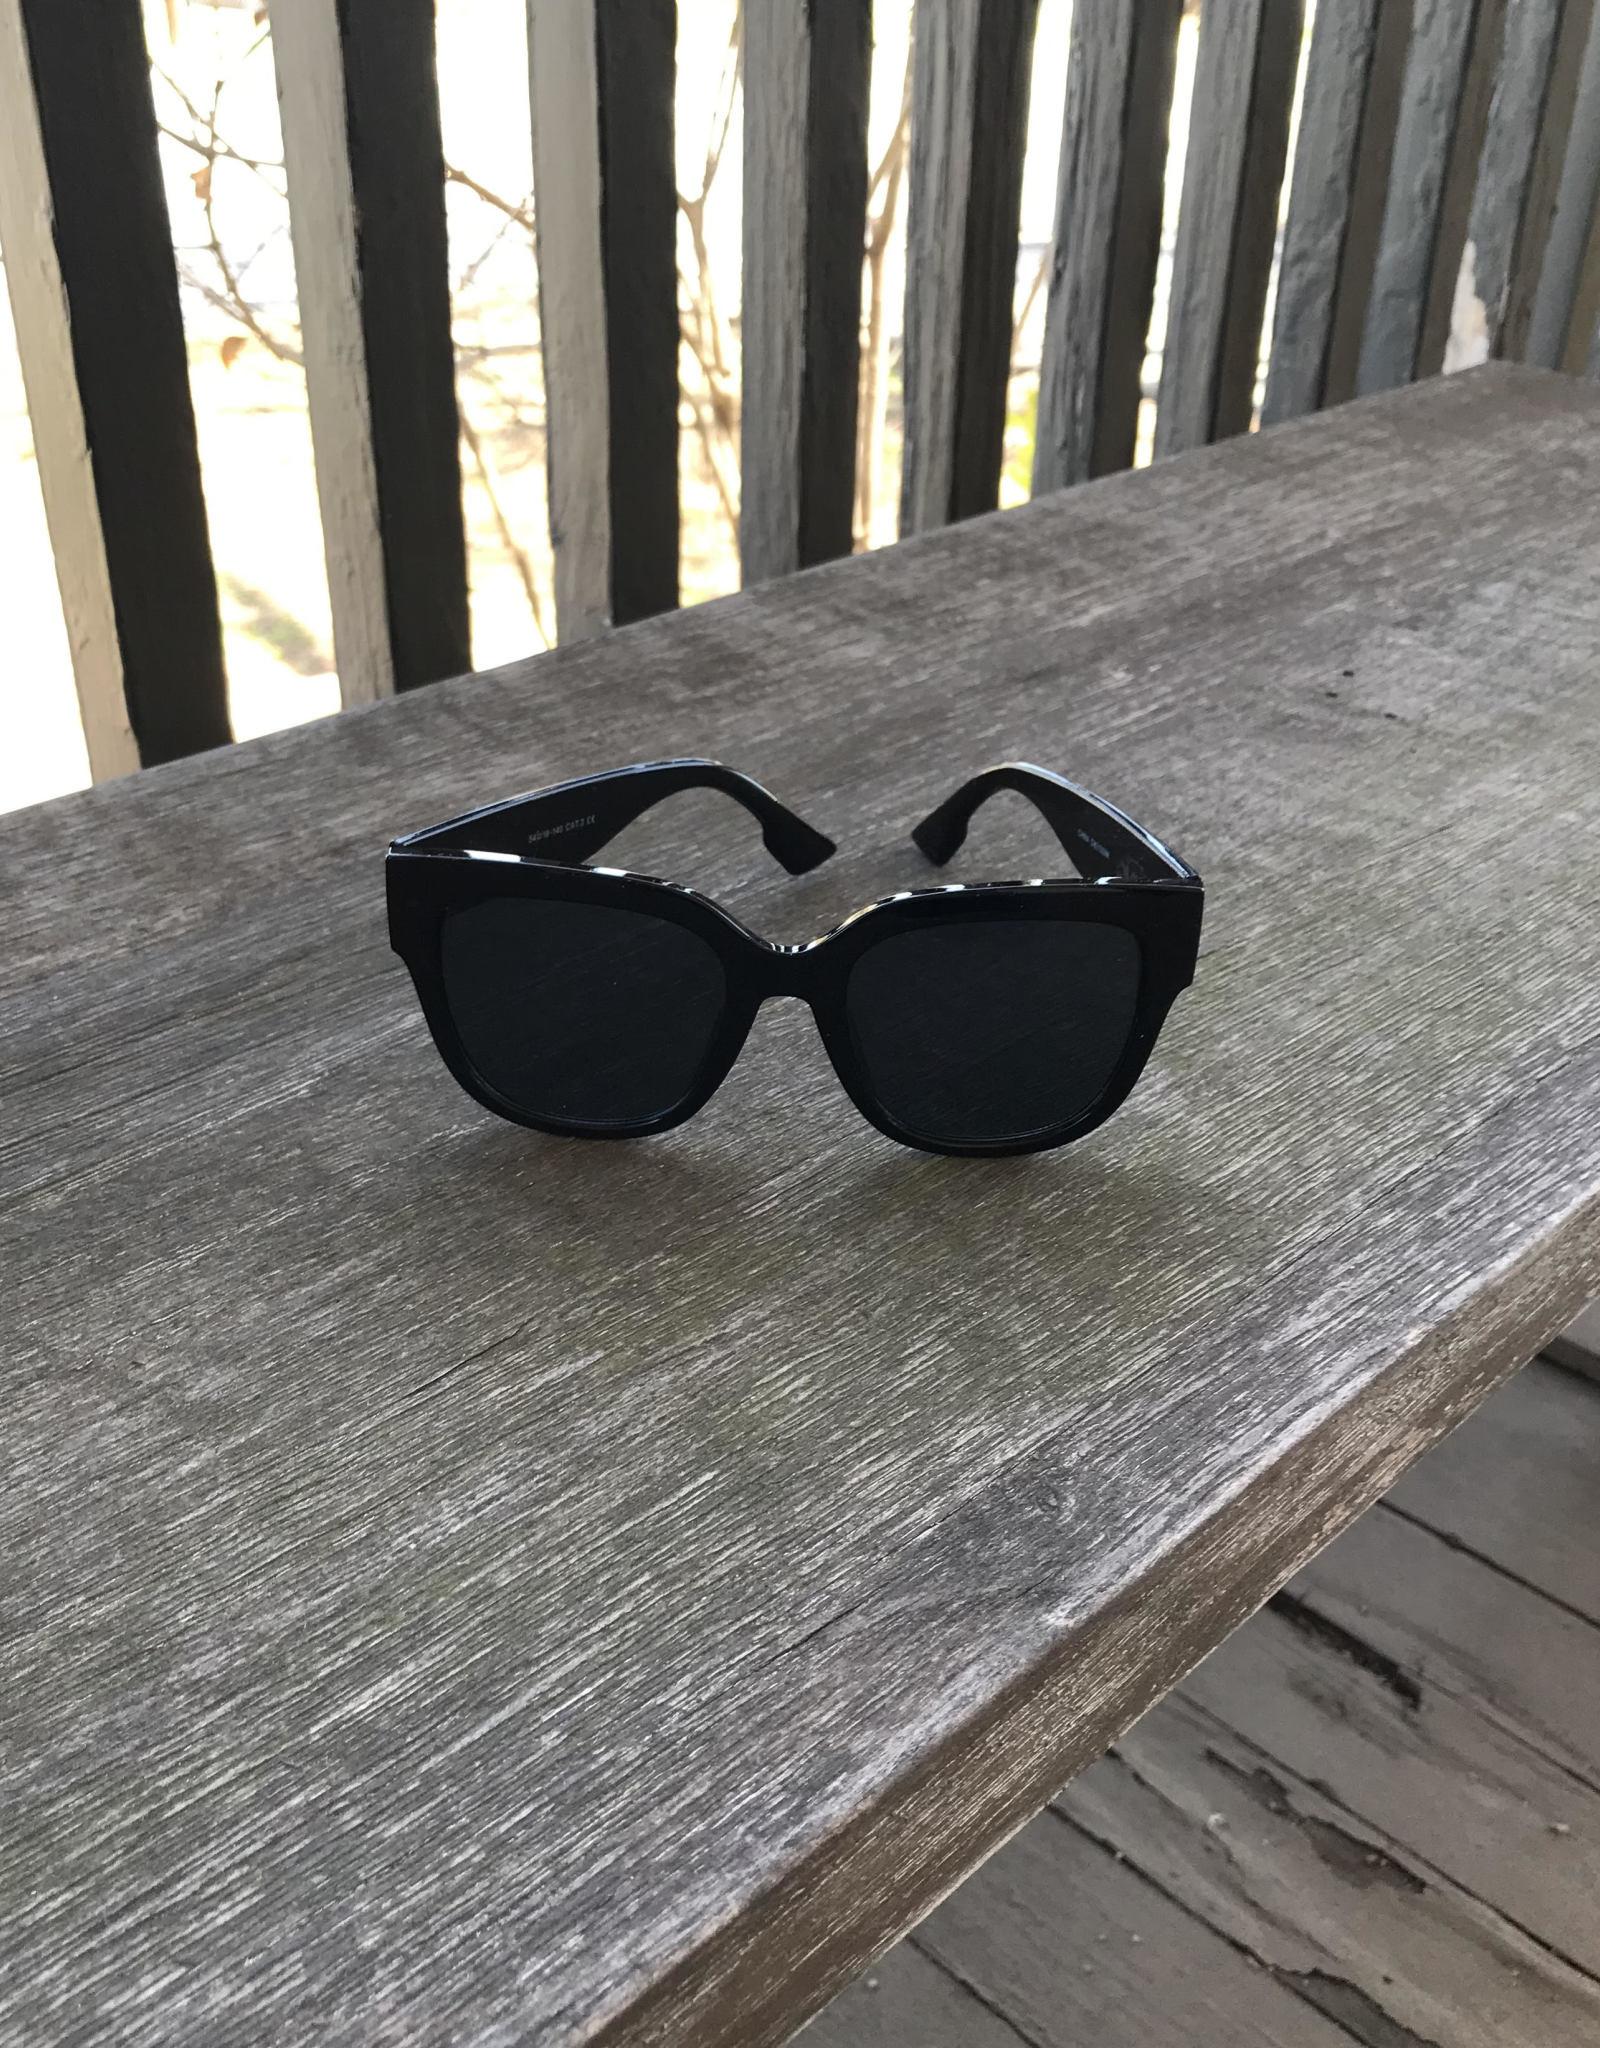 Wink Black Fashion Sunglasses